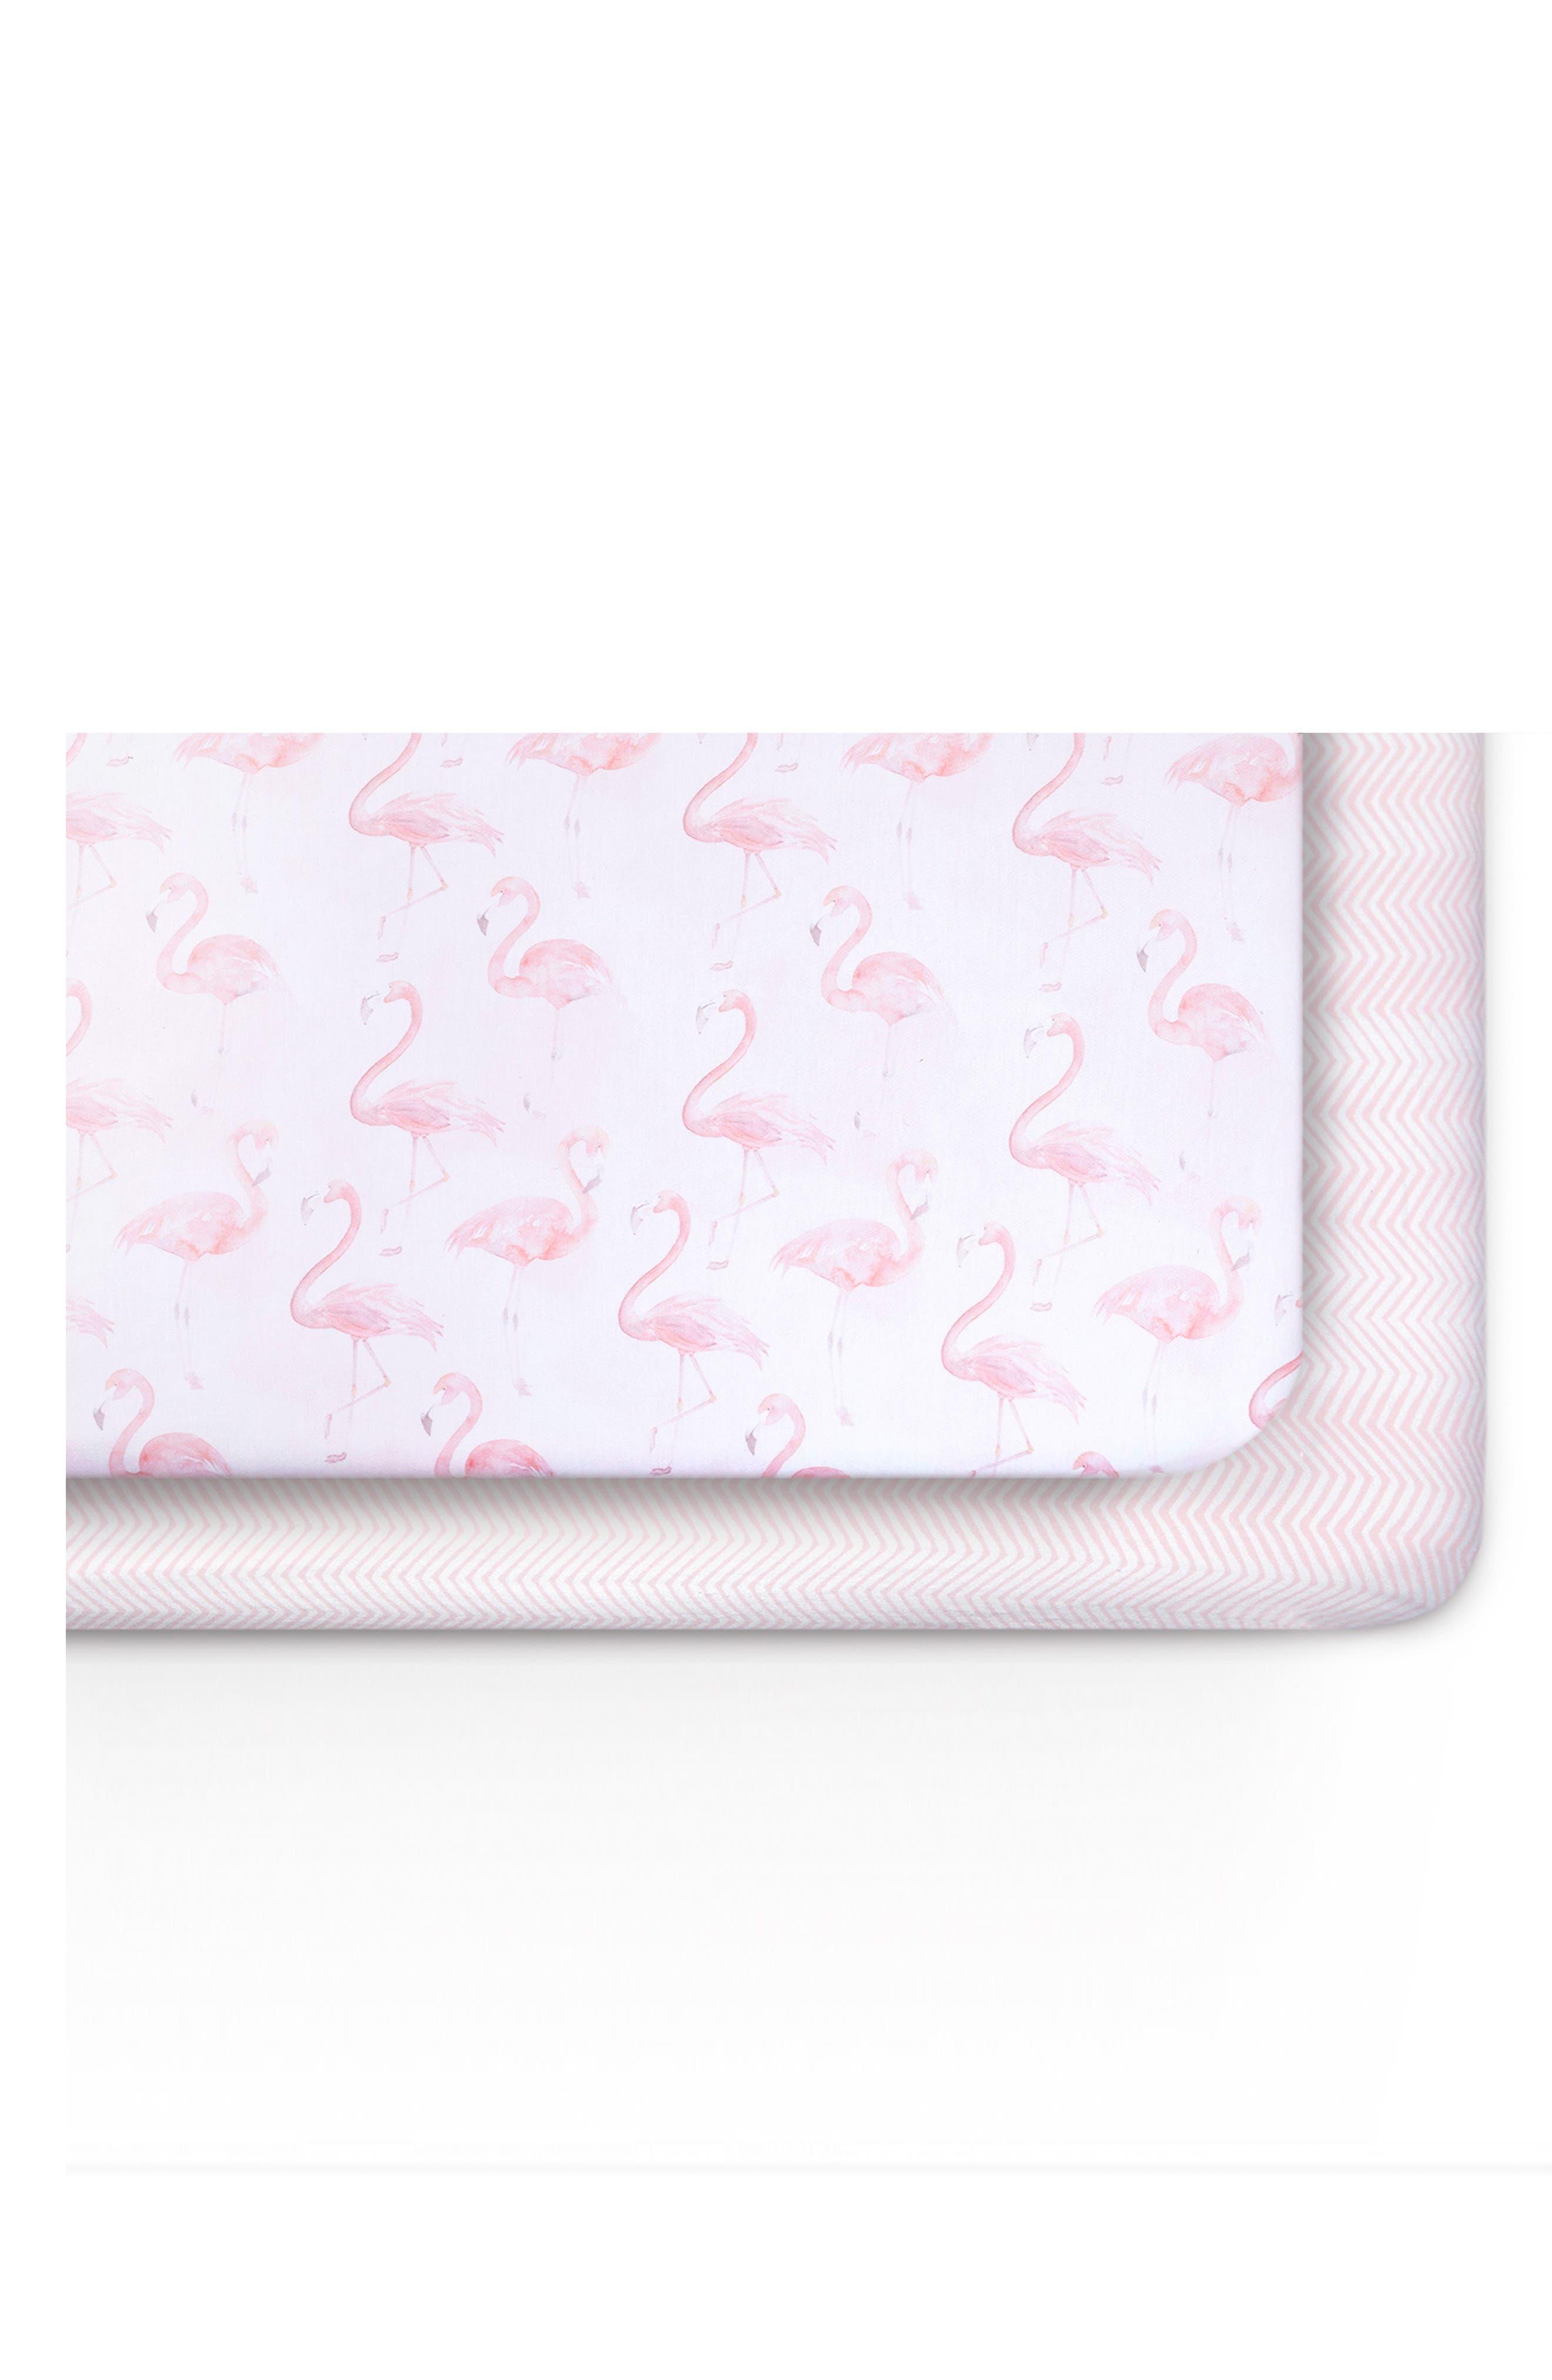 Flamingo & Zig-Zag 2-Pack Jersey Crib Sheets,                             Main thumbnail 1, color,                             Flamingo